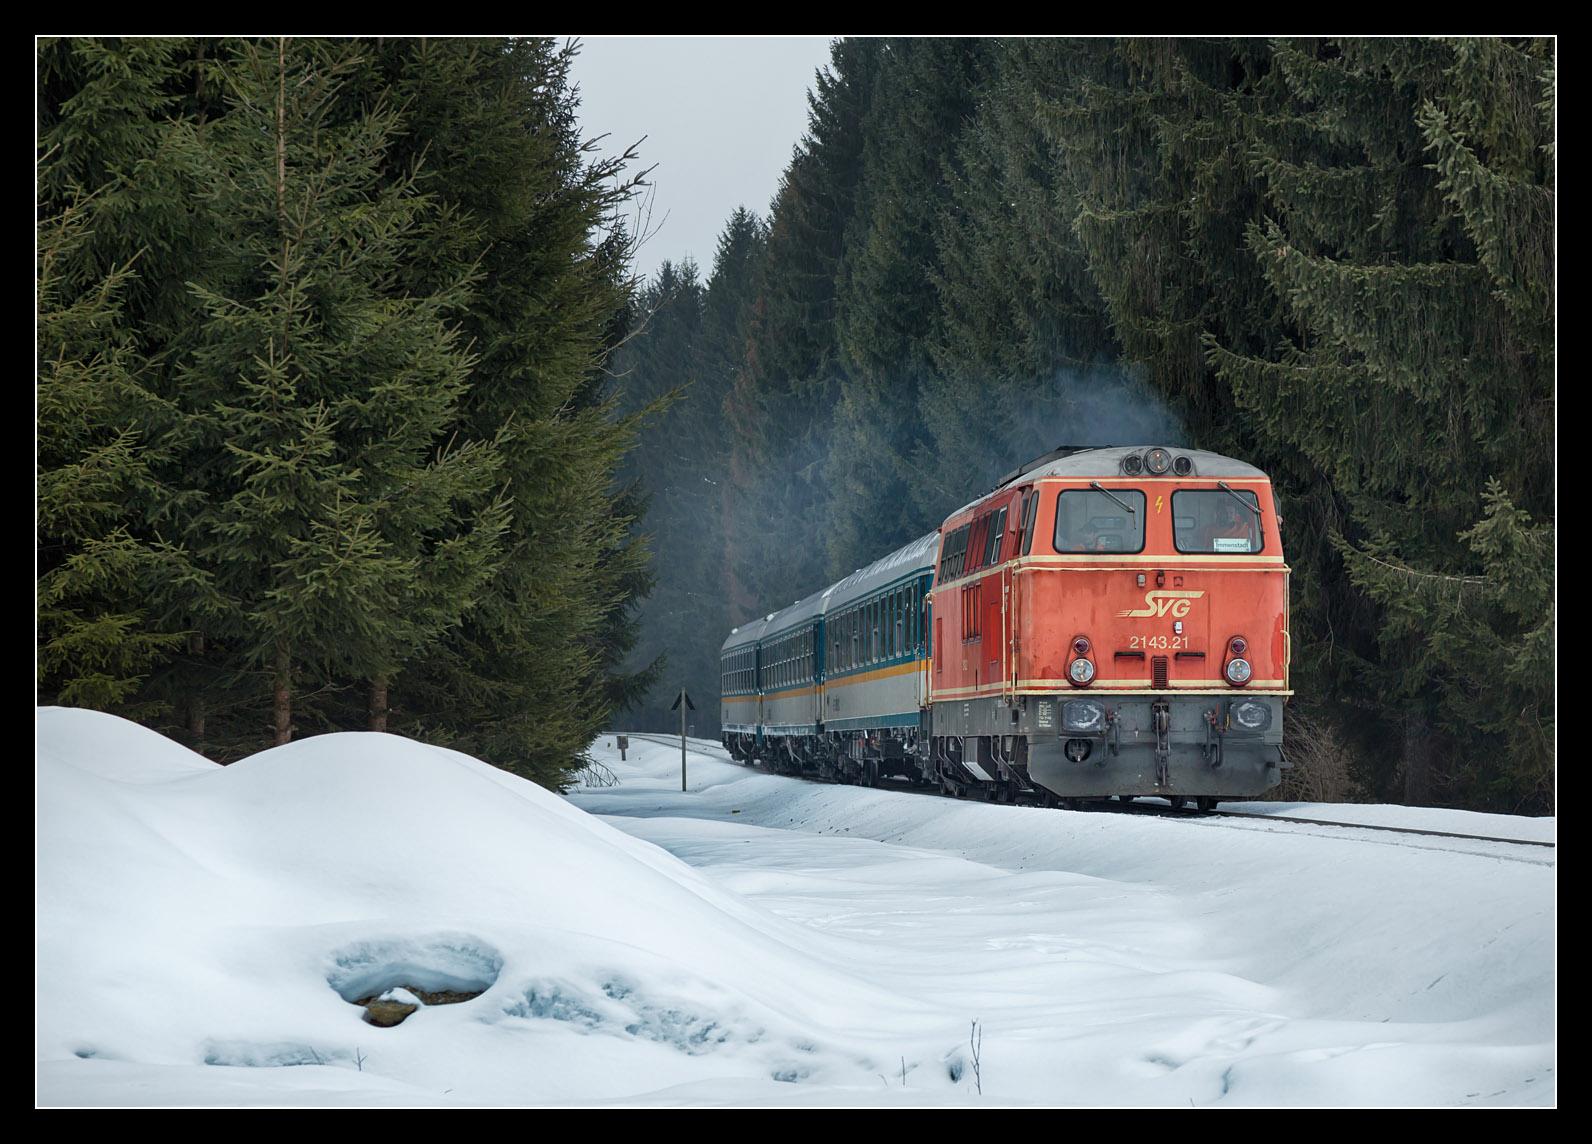 http://raildata.info/zeug/wint181.jpg